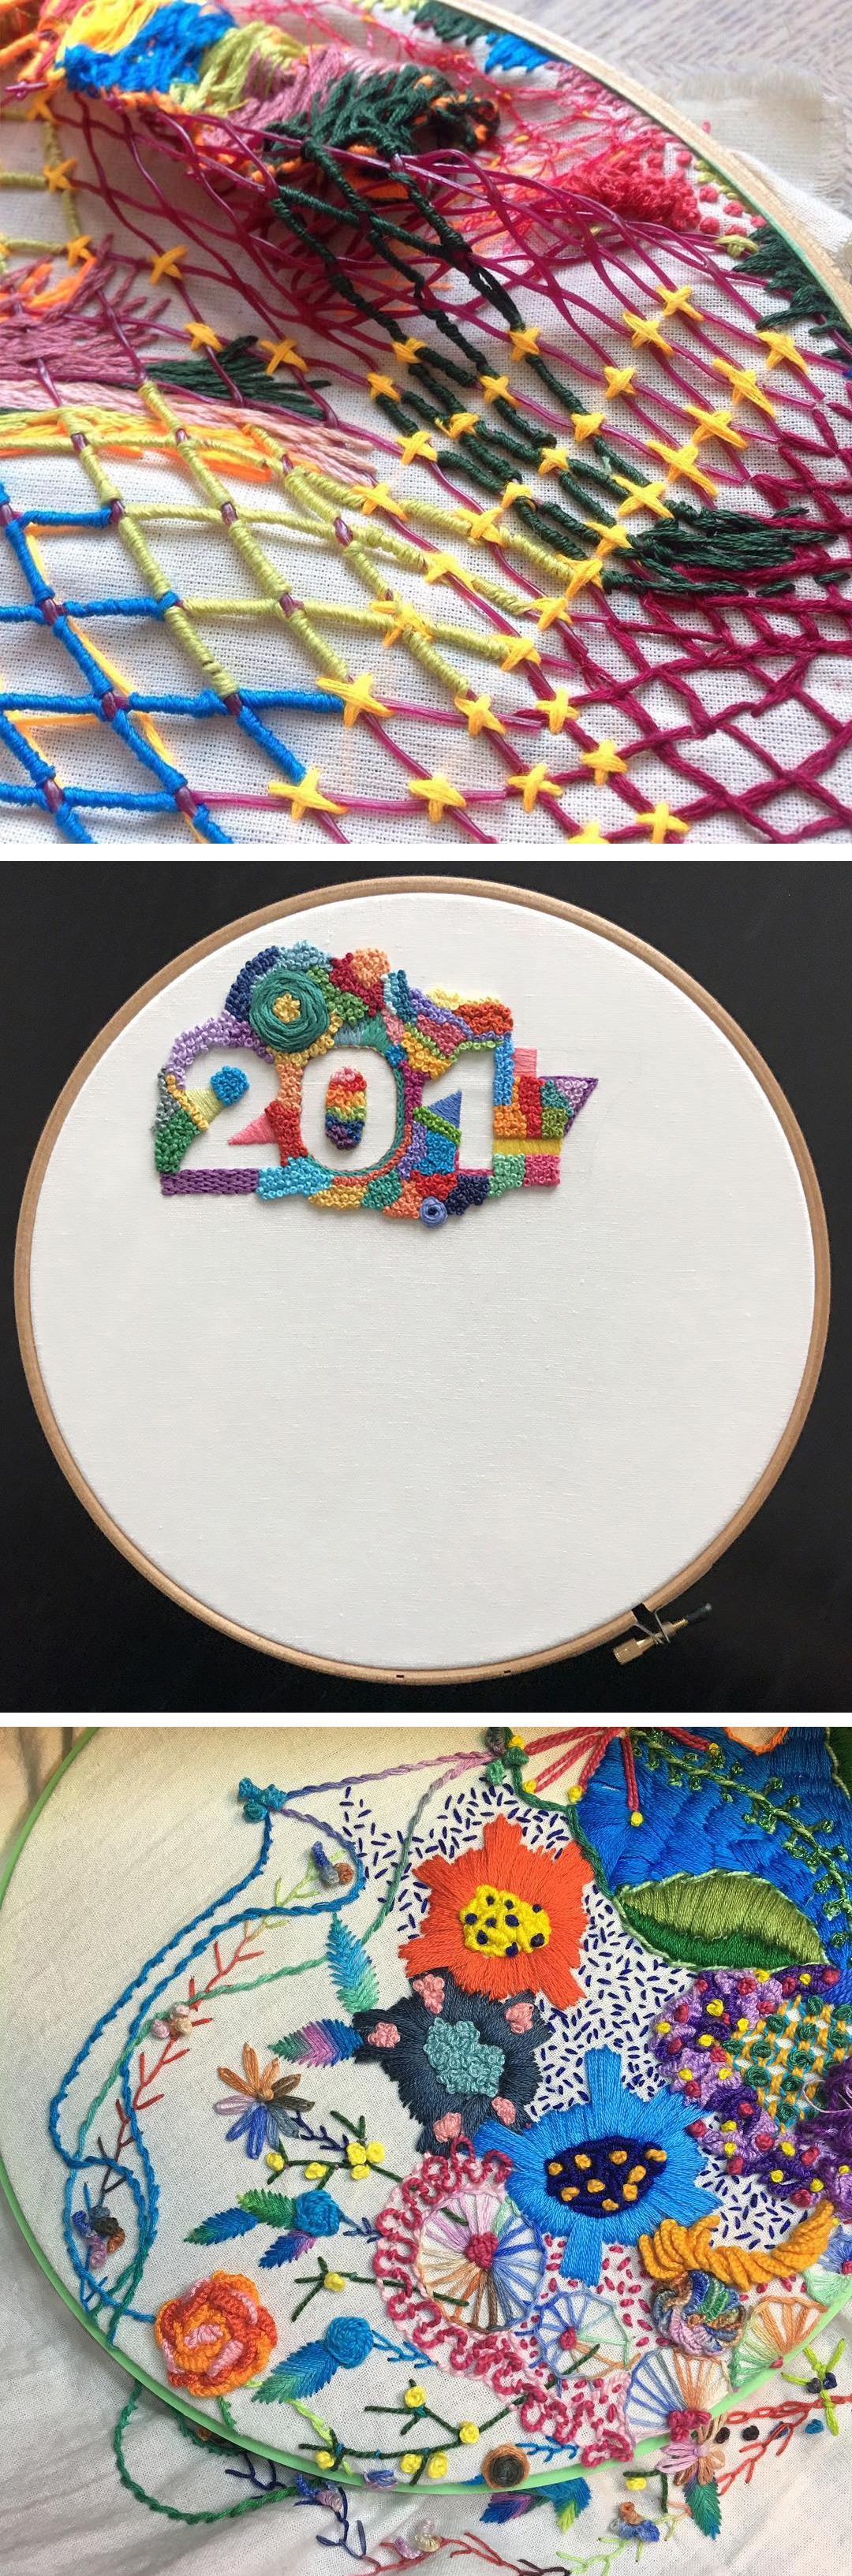 1 Year of Stitches, February recap 2017